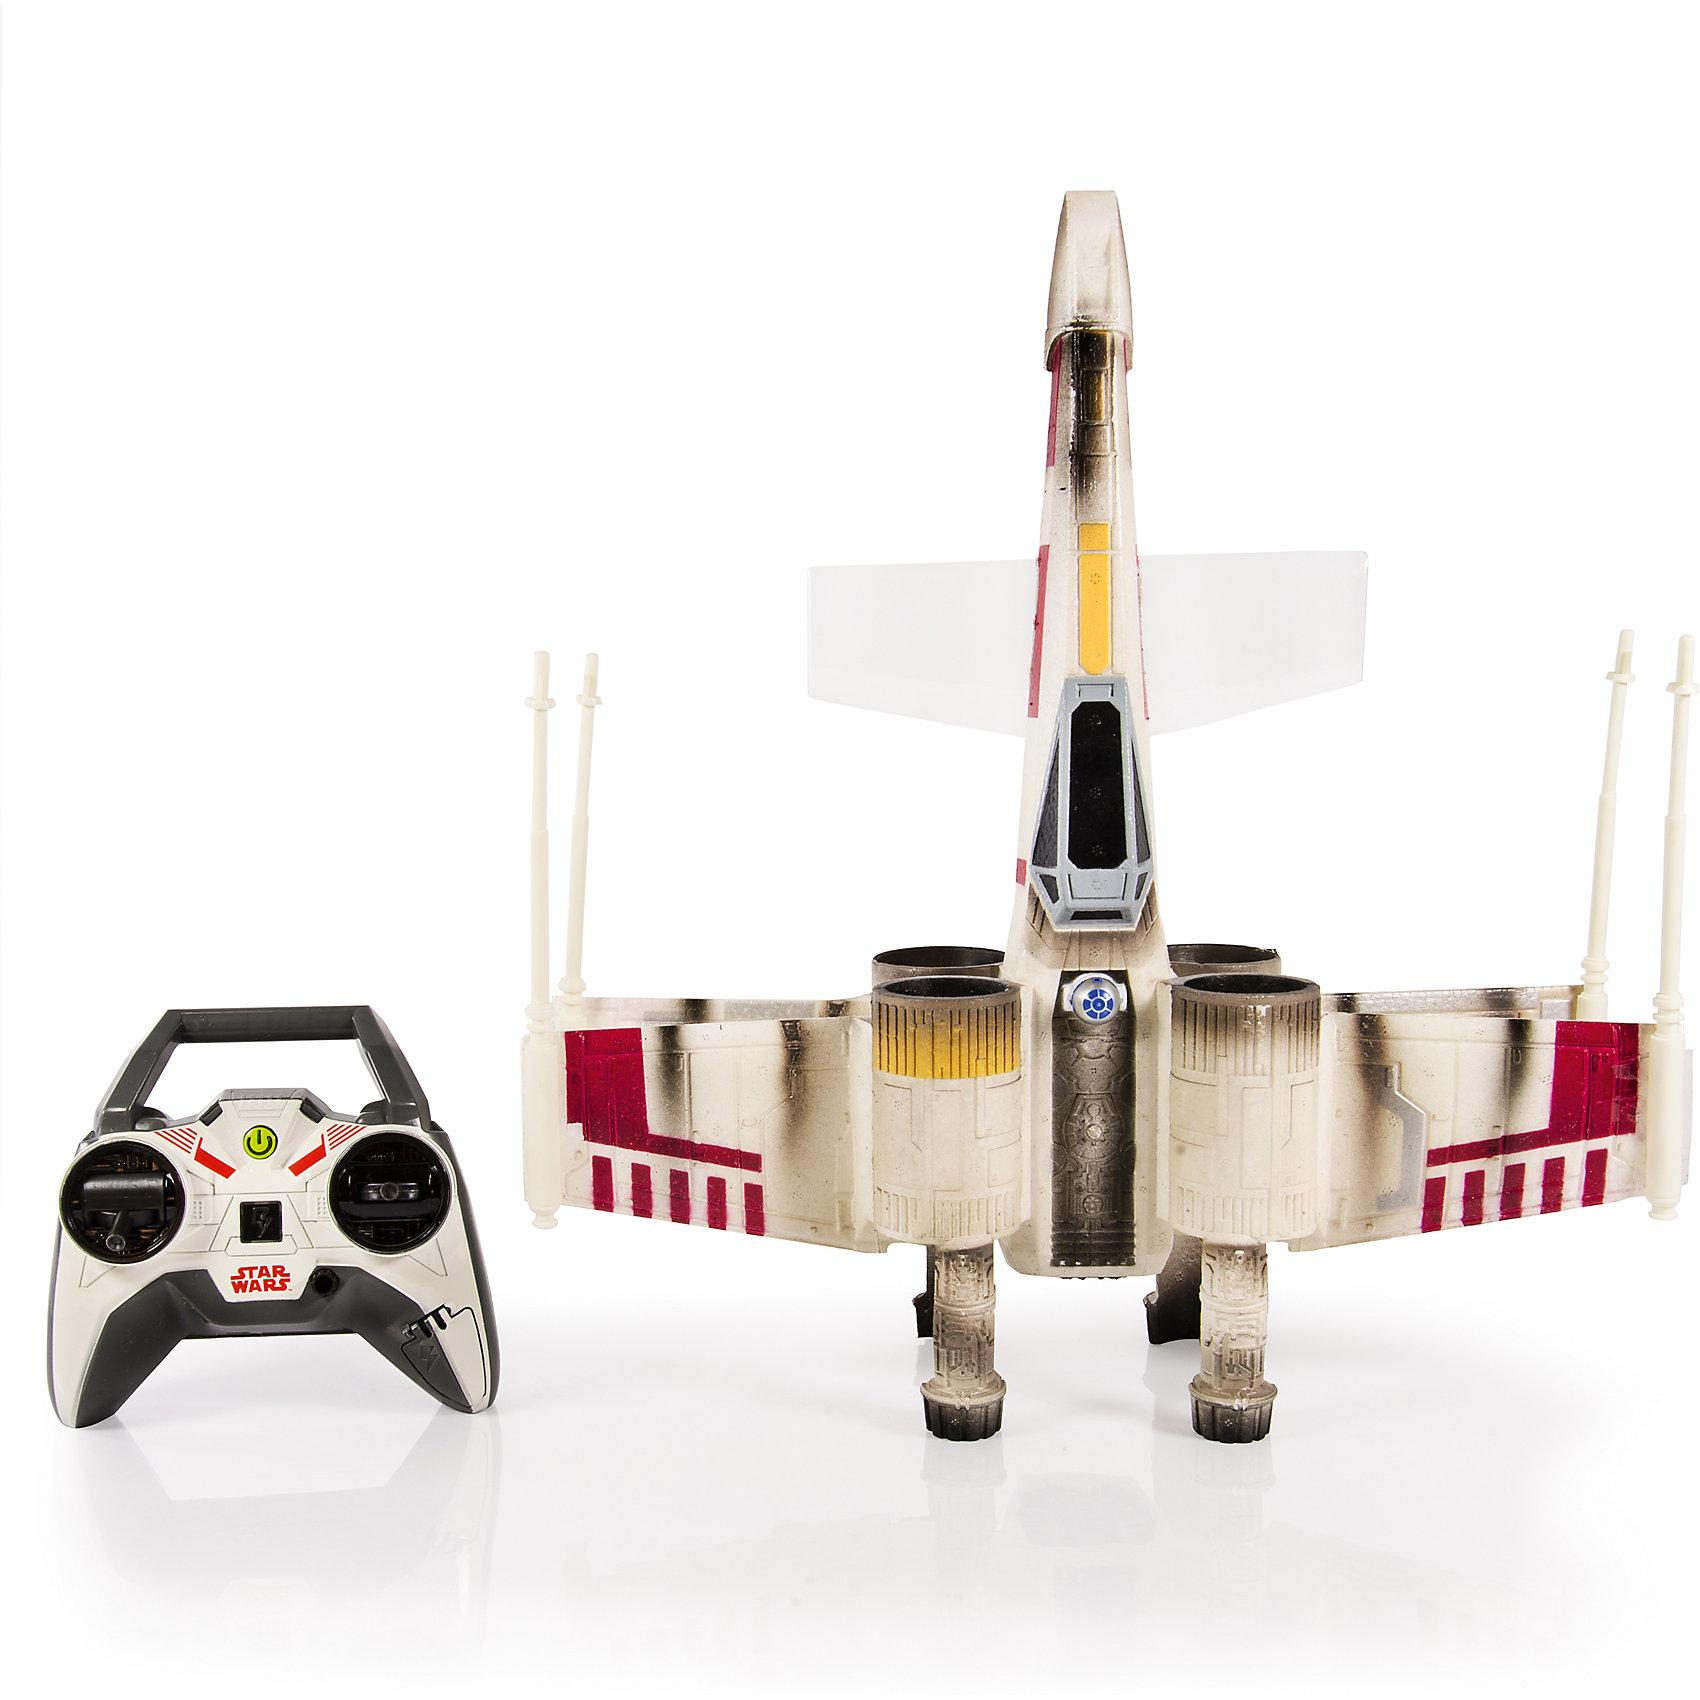 Spin Master Звёздный истребитель, Air Hogs, Звёздные войны diy flower lace board carbon steel cutting die